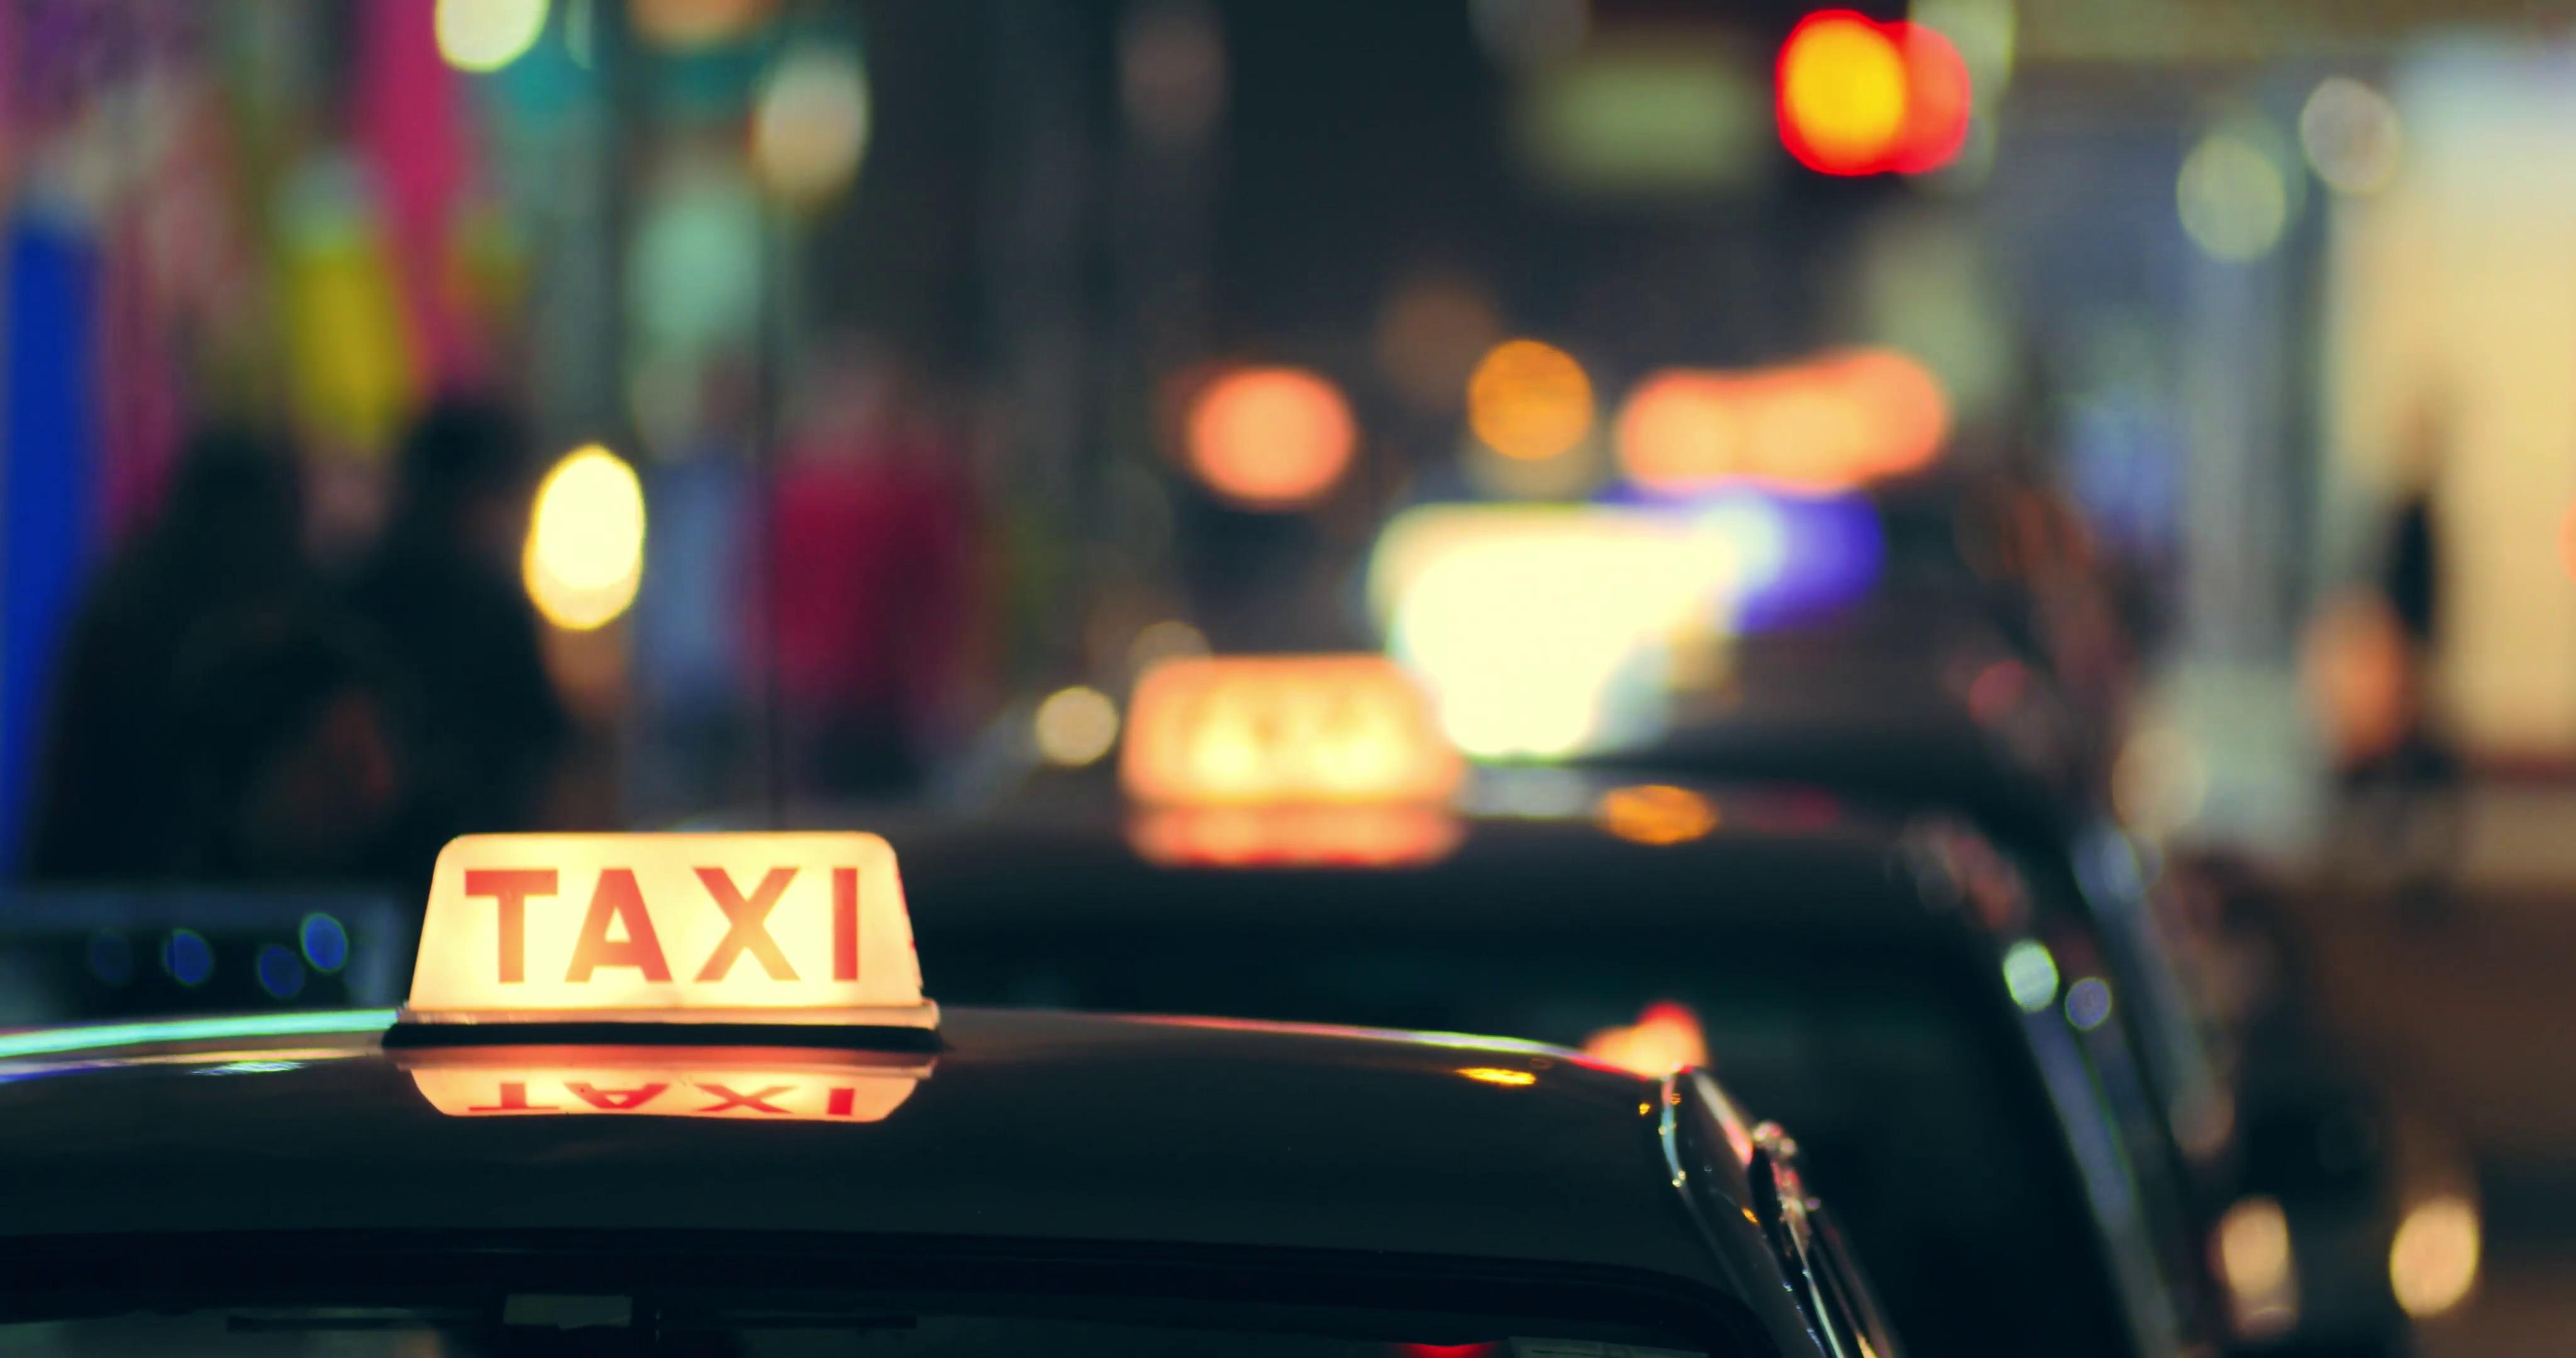 Many taxi cars in Hong Kong downtown at night Abstract city 4096x2160